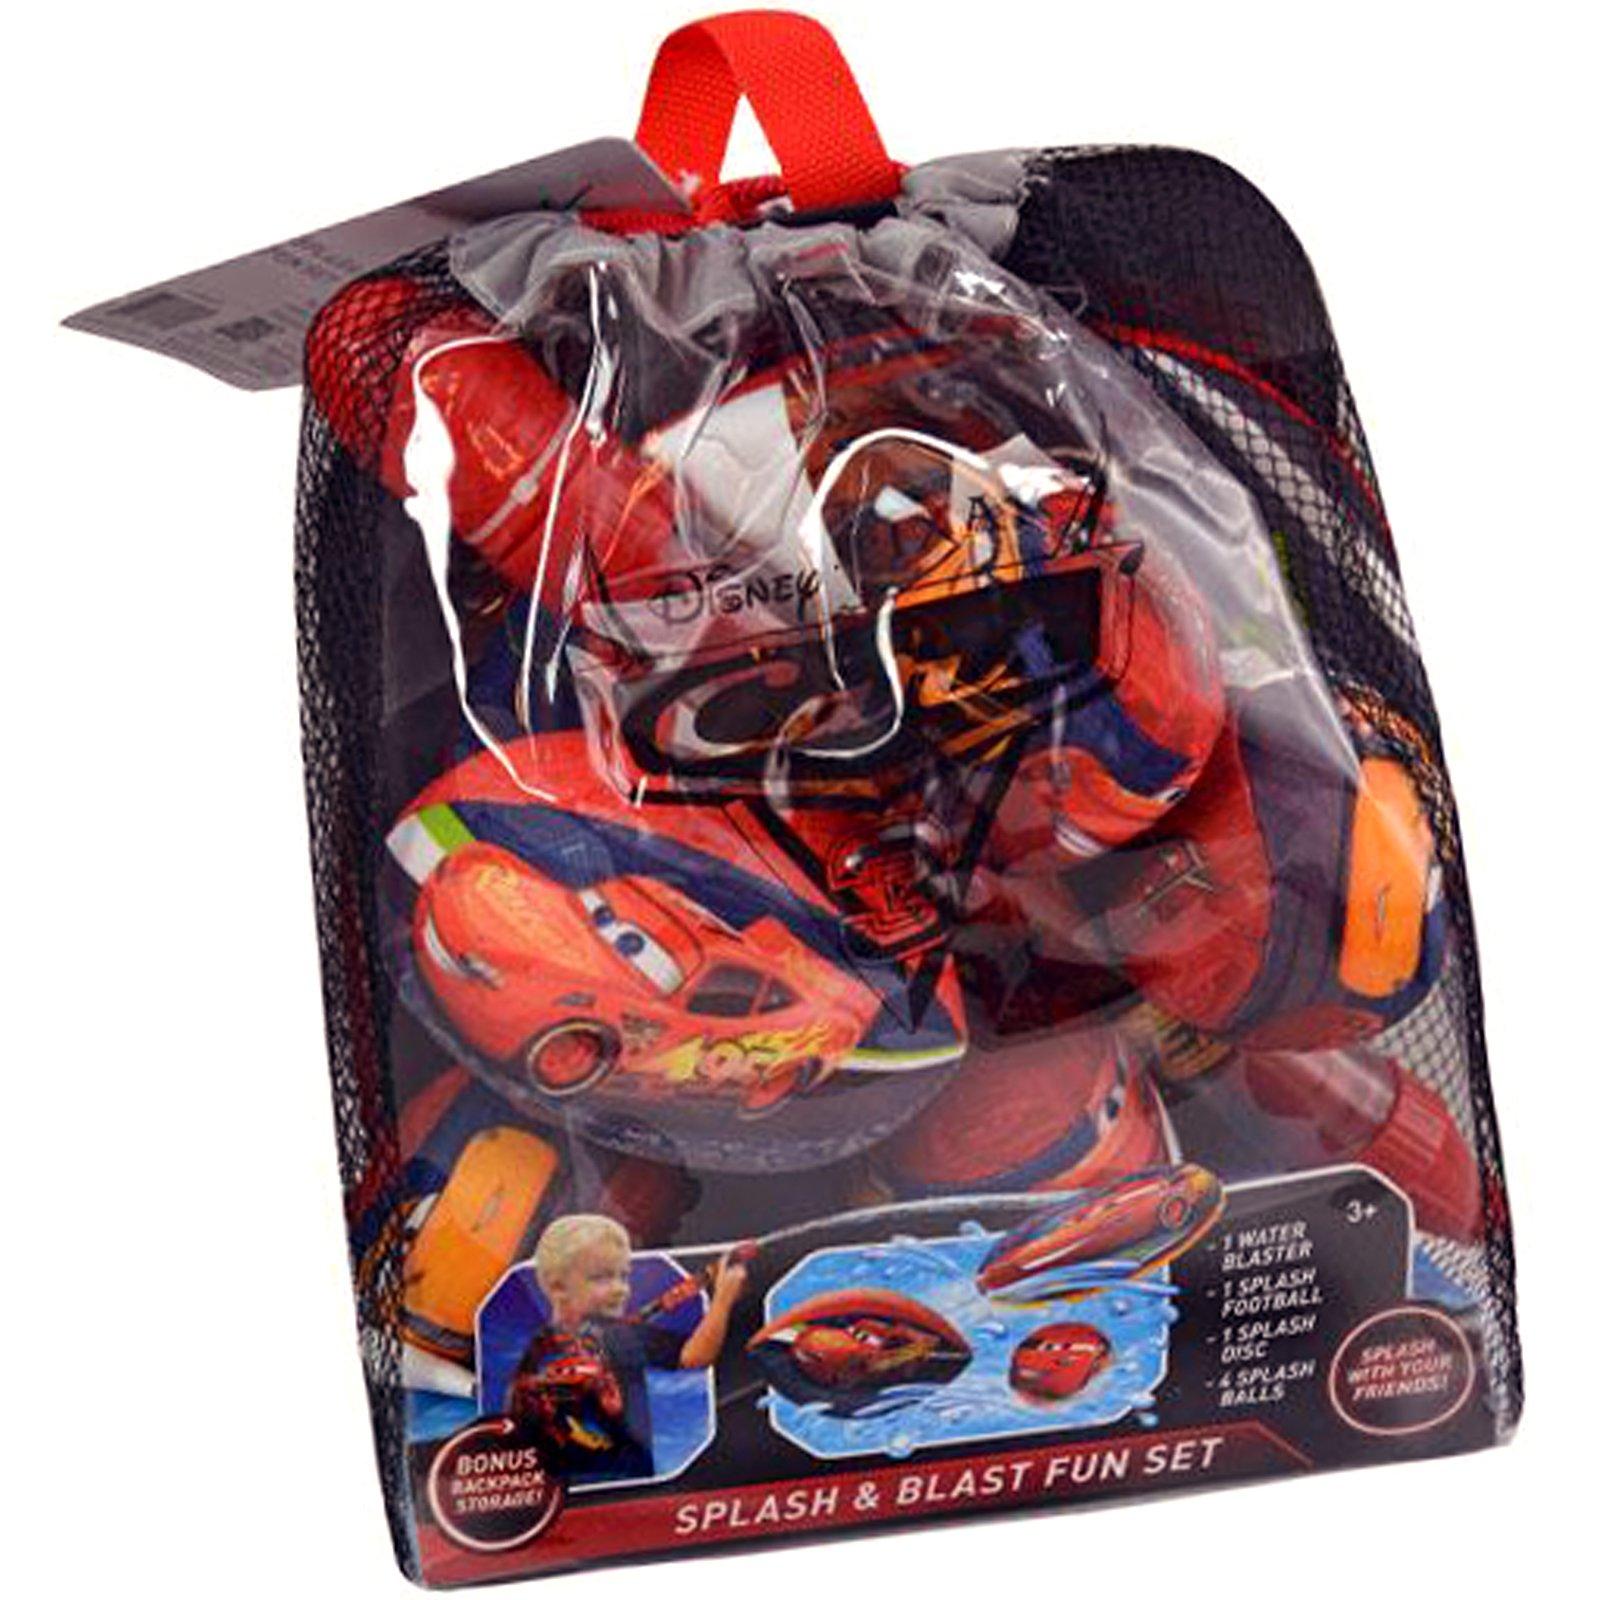 Disney Cars Splash & Blast Fun Set Backpack